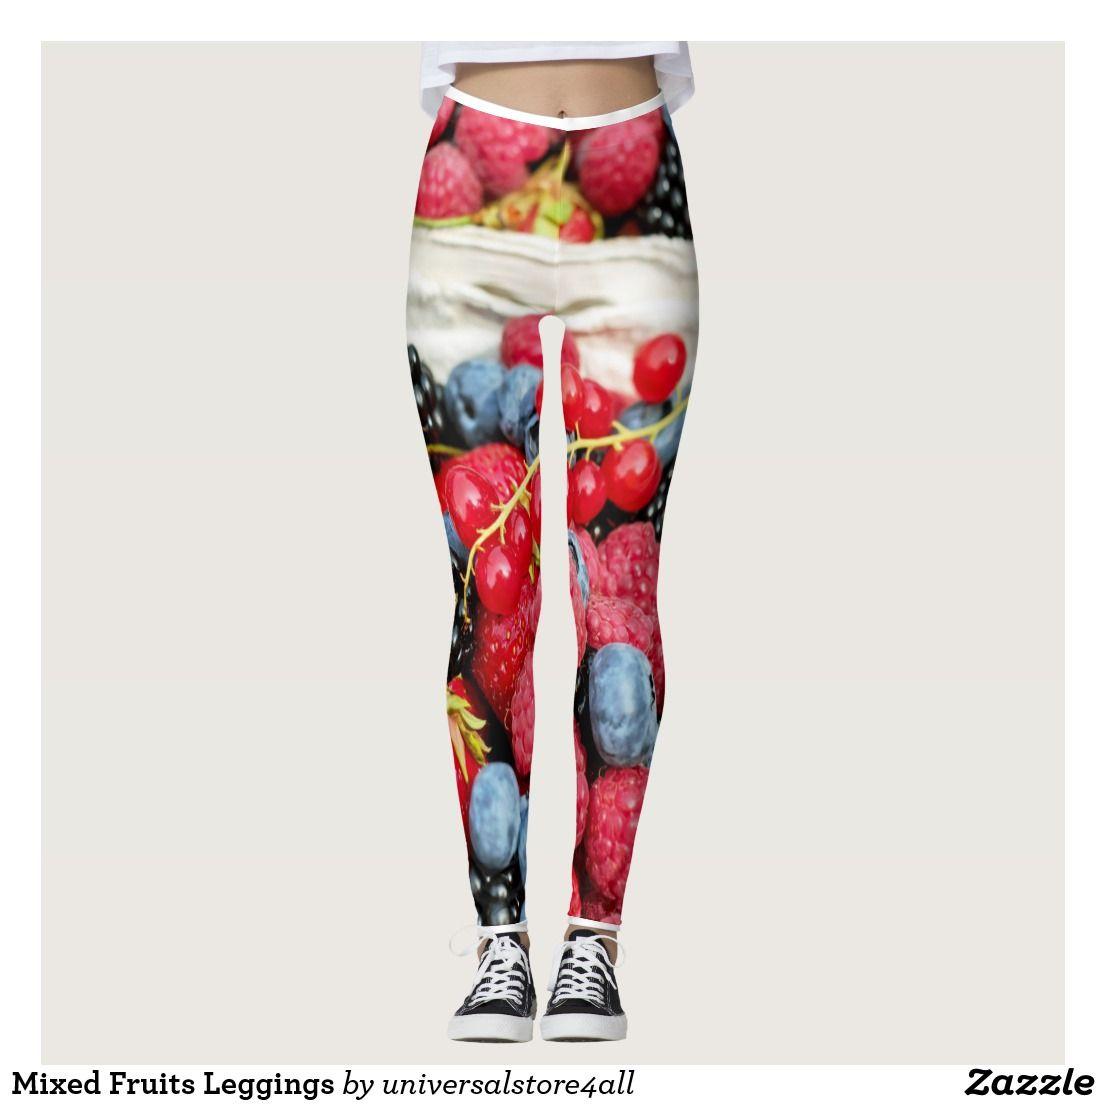 Mixed Fruits Leggings